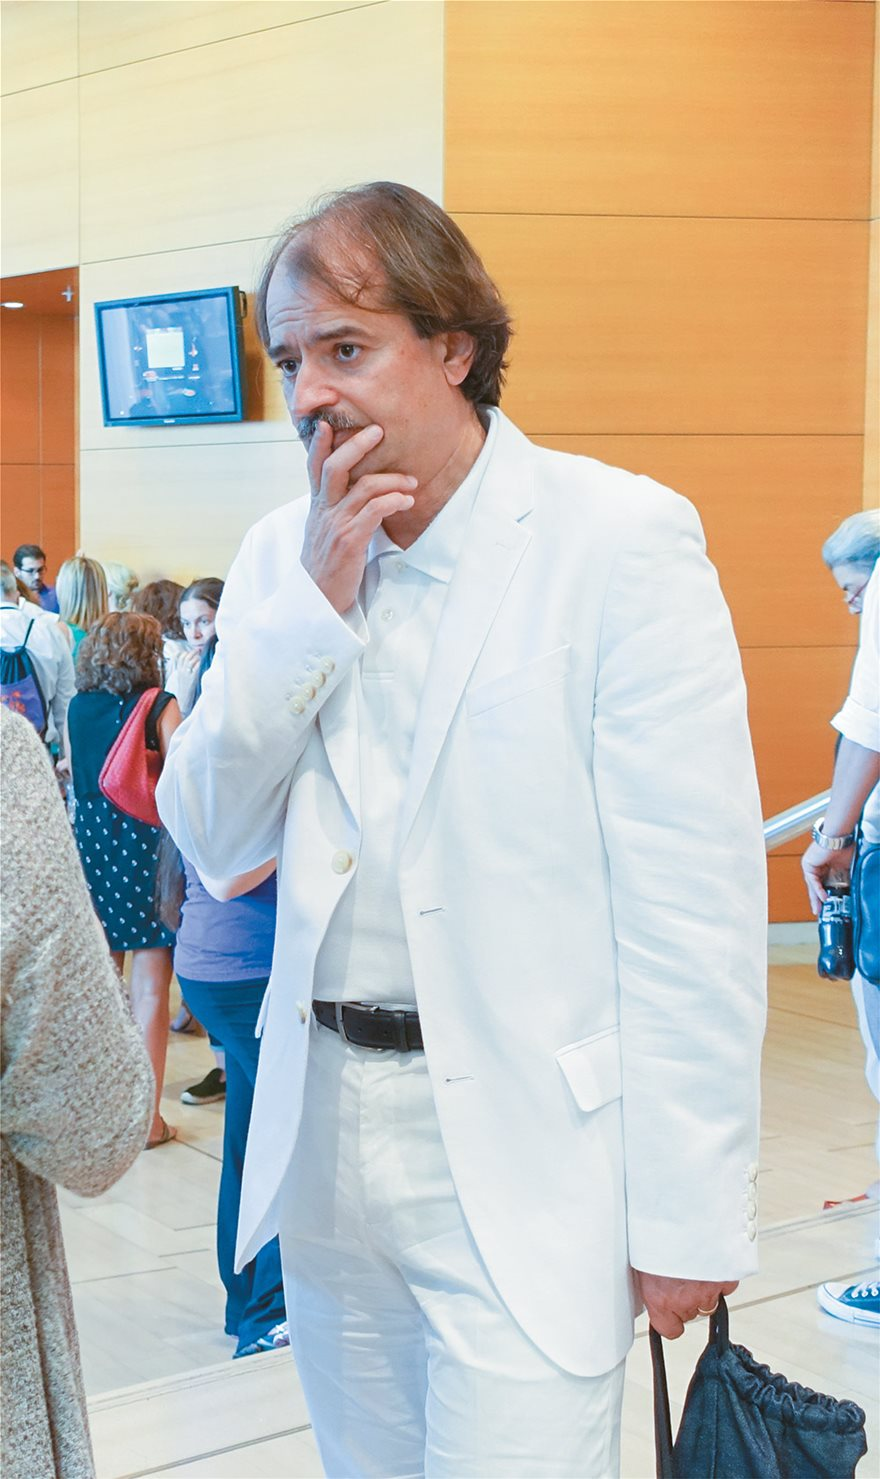 Dr Ιωάννης Ιωαννίδης για κορωνοϊό: Μετά από τόσους μήνες, δεν έχουμε καταλάβει πού βρισκόμαστε